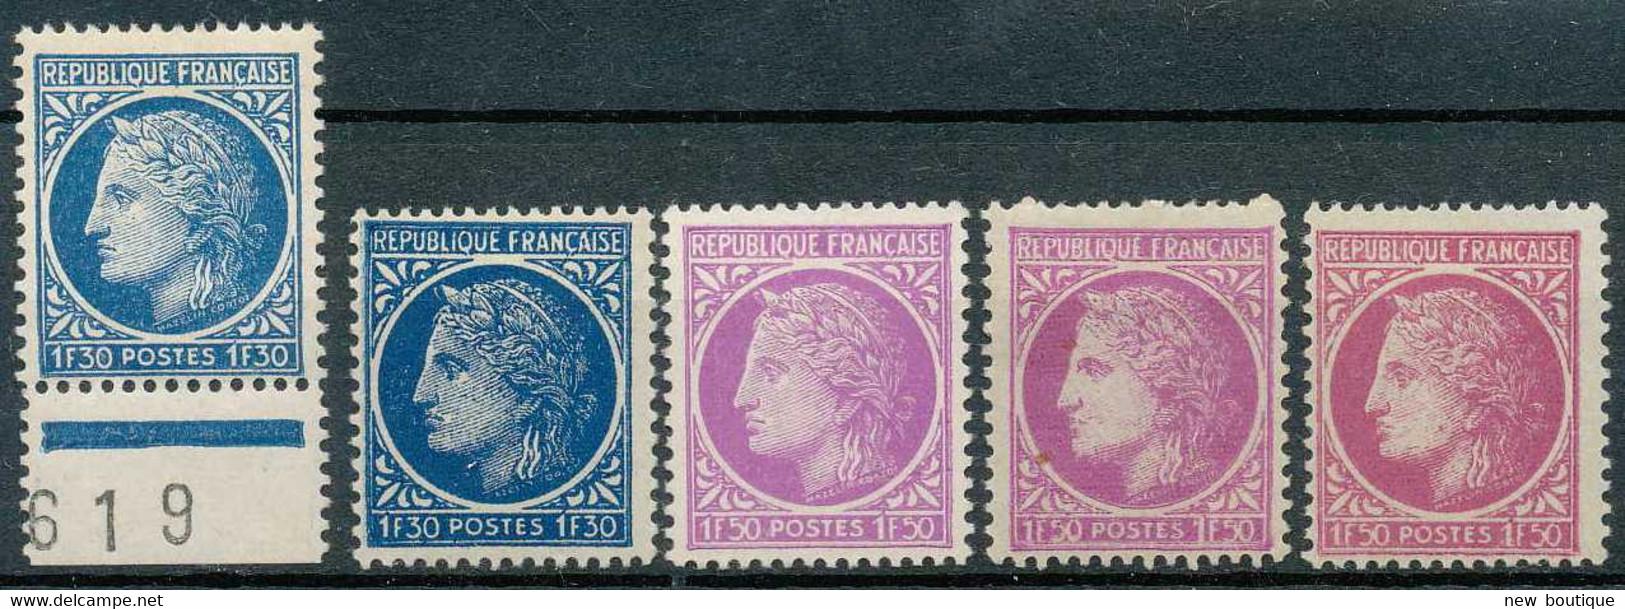 NB - [100266]TB//*/Mh-N° 678/79, En Diverses Très Belles Nuances - 1945-47 Ceres De Mazelin